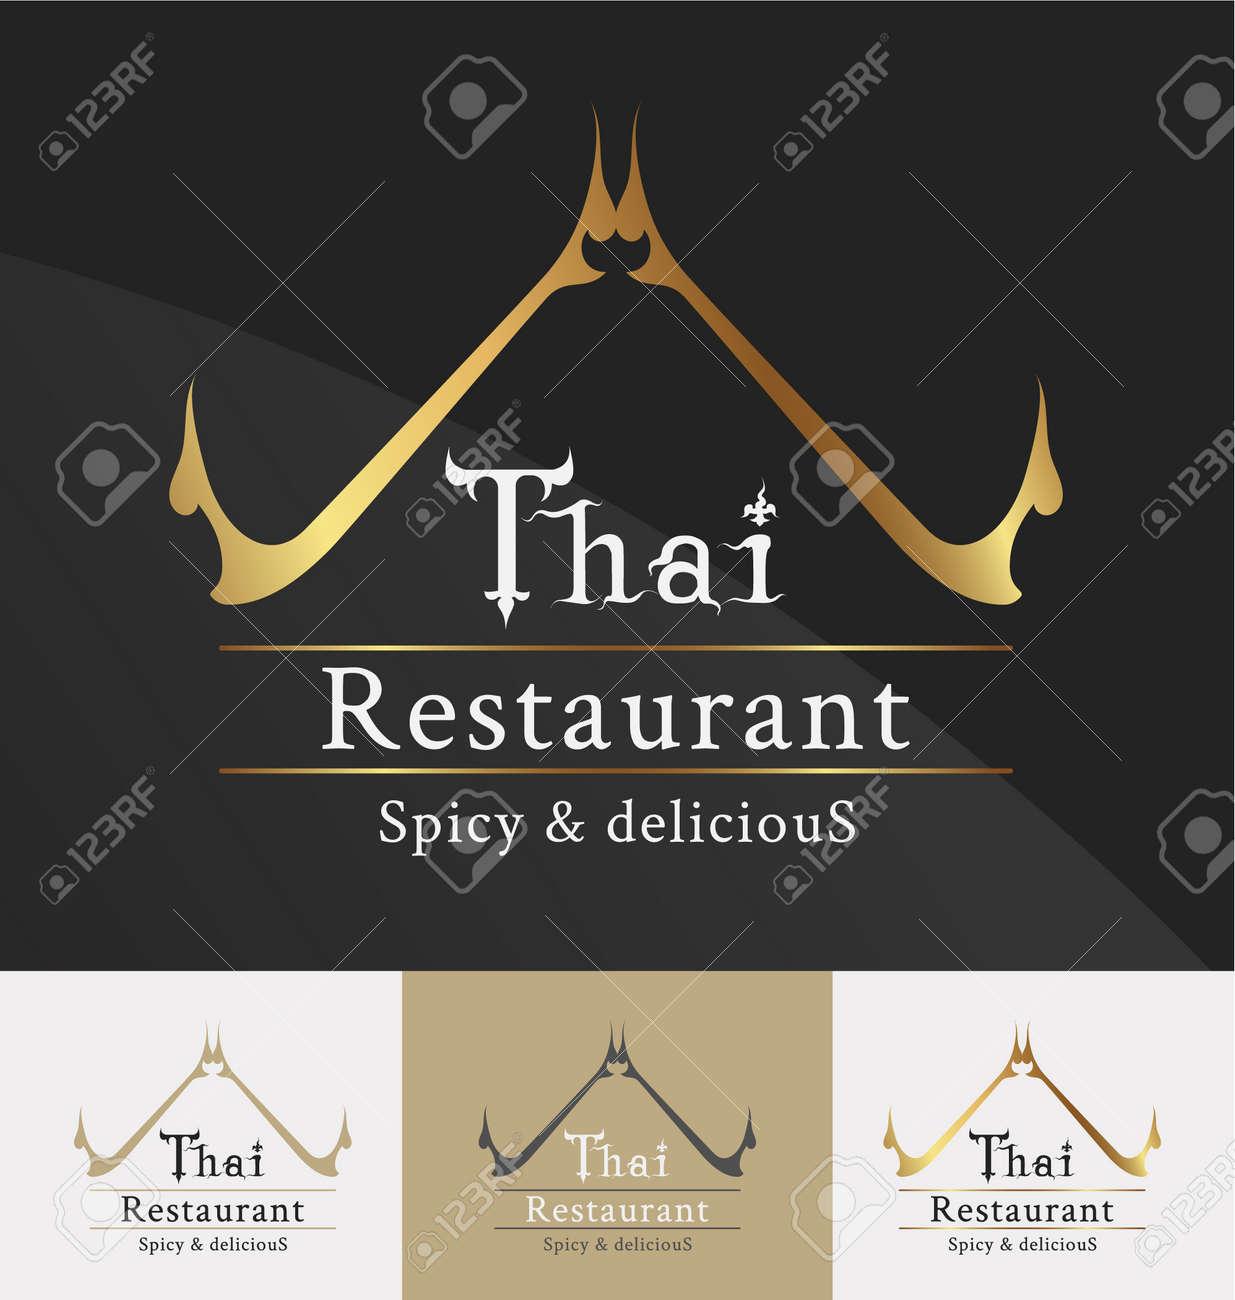 Thai restaurant logo template design. Thai art decoration element. Vector illustration - 46956844